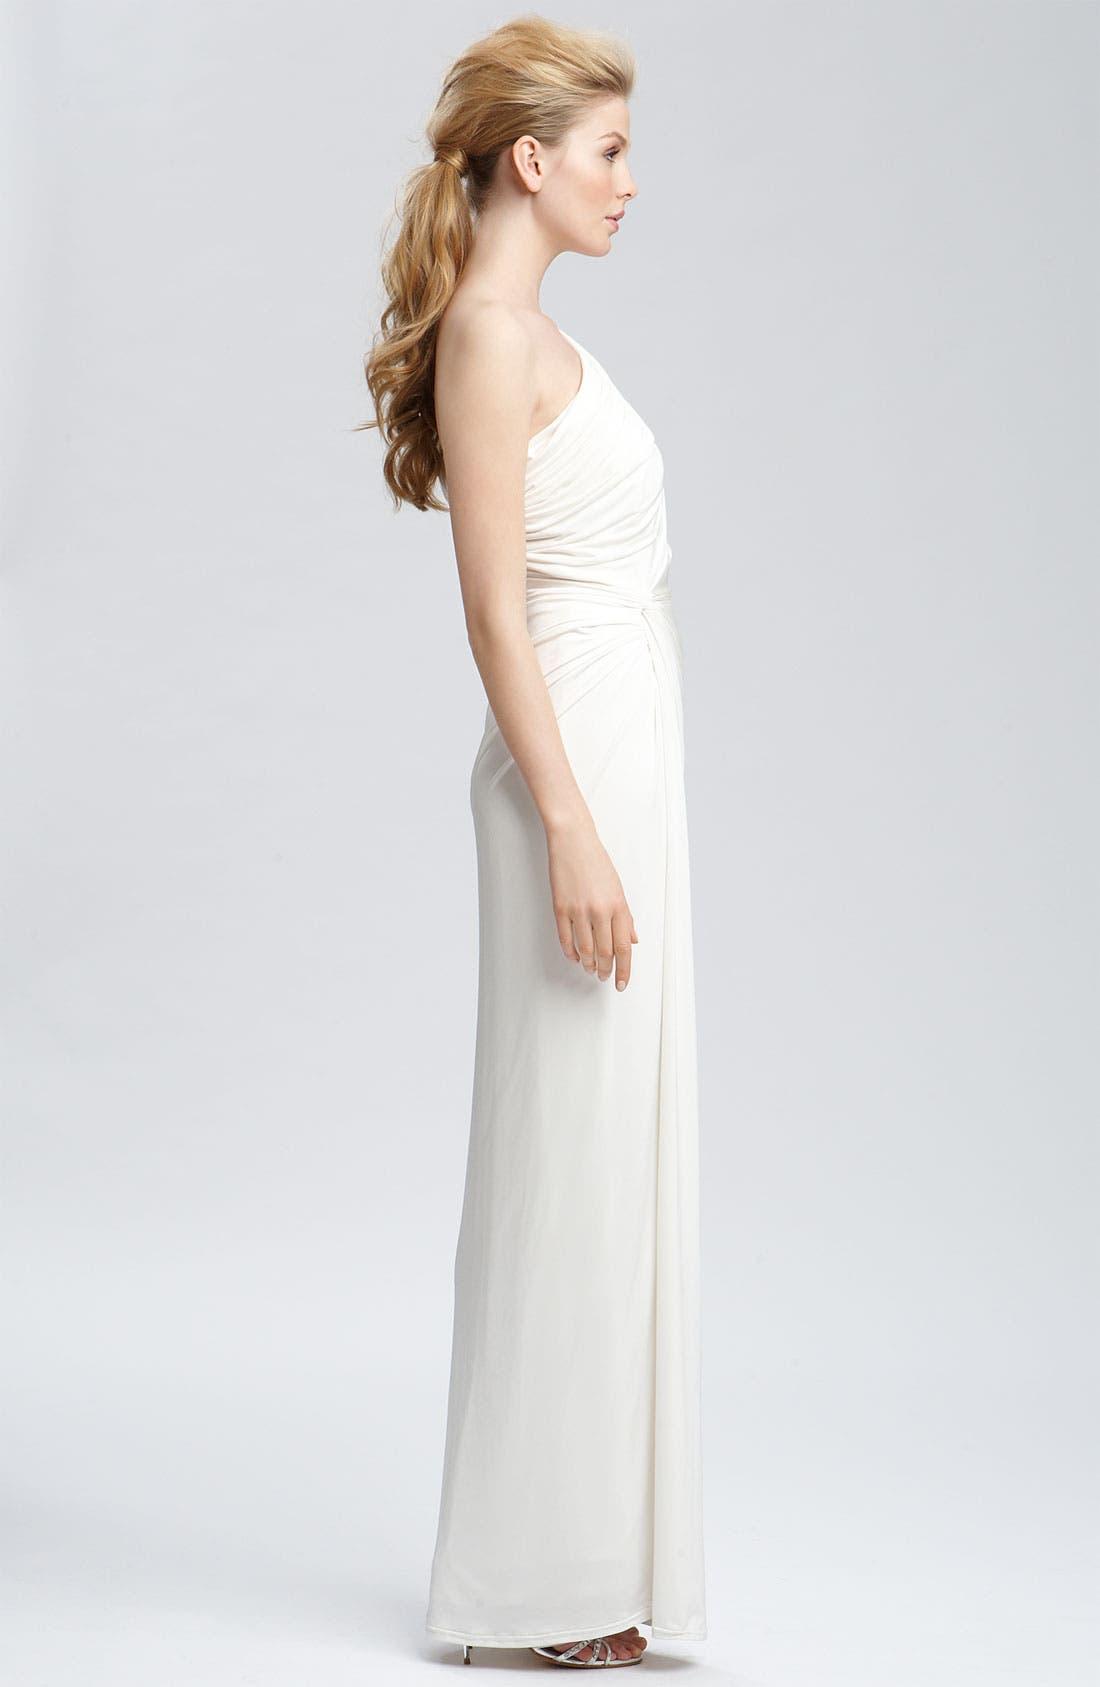 TADASHI SHOJI, Beaded Jersey One Shoulder Gown, Alternate thumbnail 4, color, 900